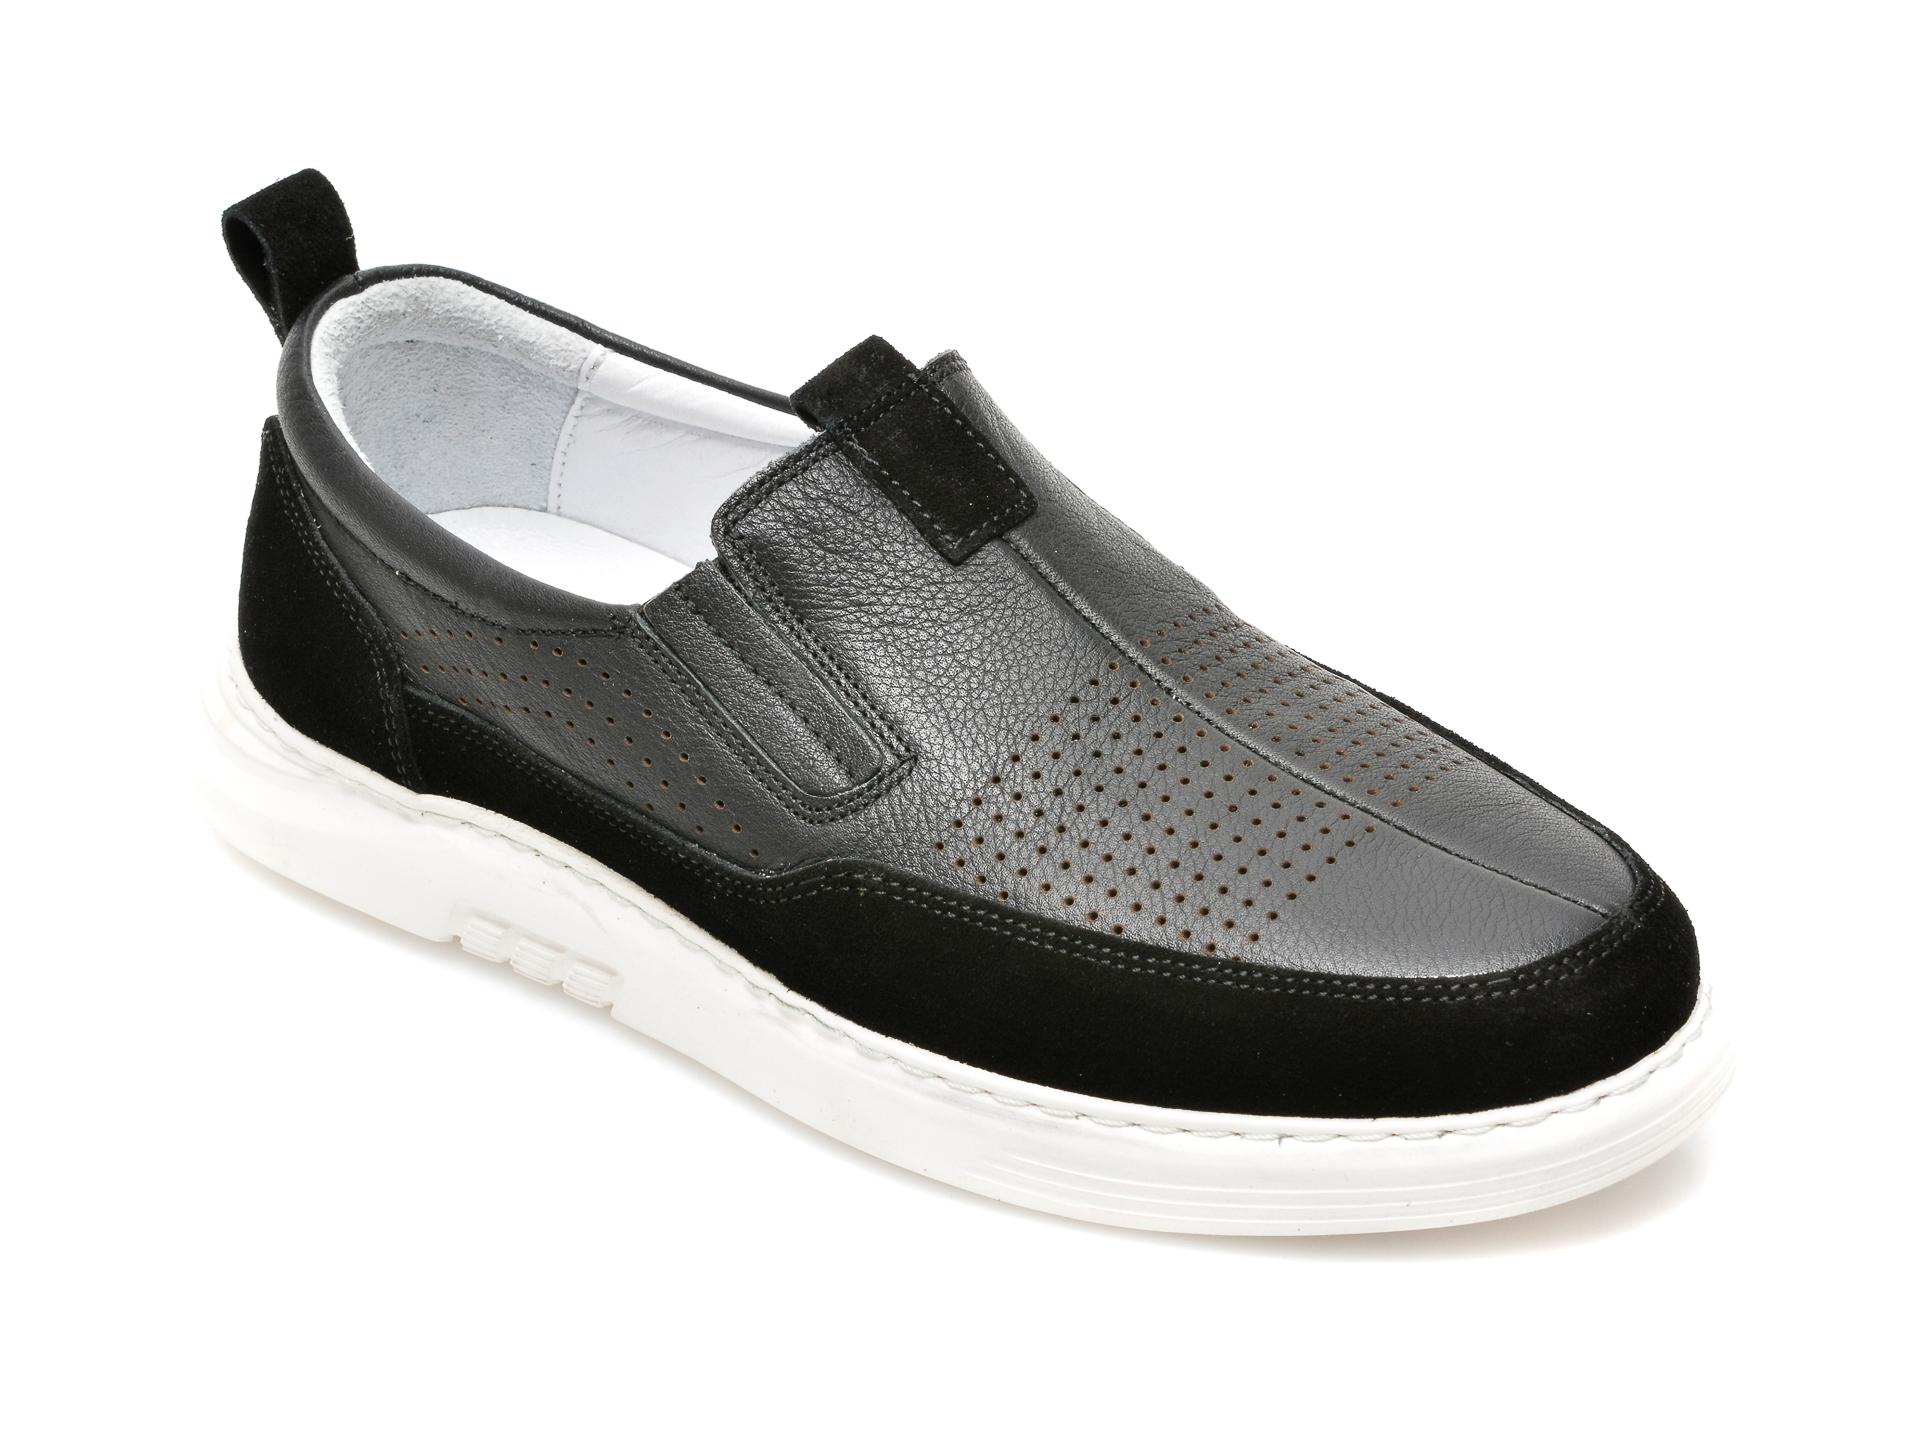 Pantofi OTTER negri, 2026, din piele naturala